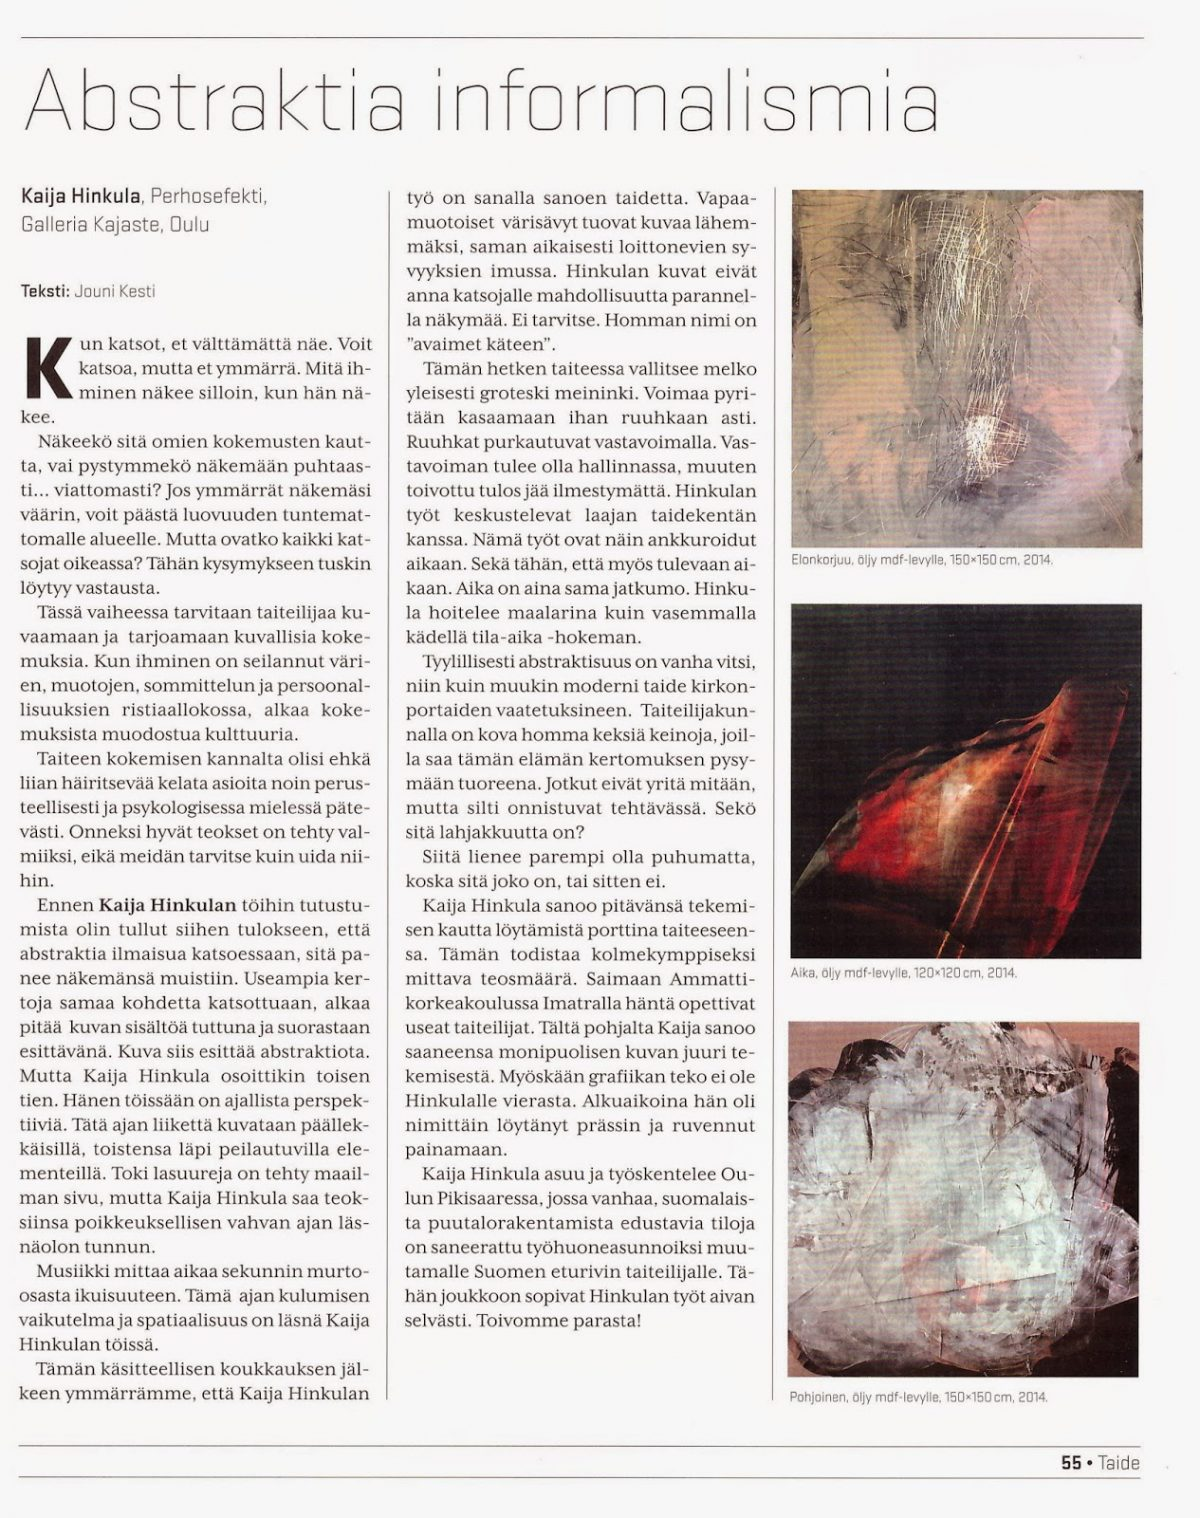 Abstraktia informalismia – Perhosefekti-näyttelyn arvio